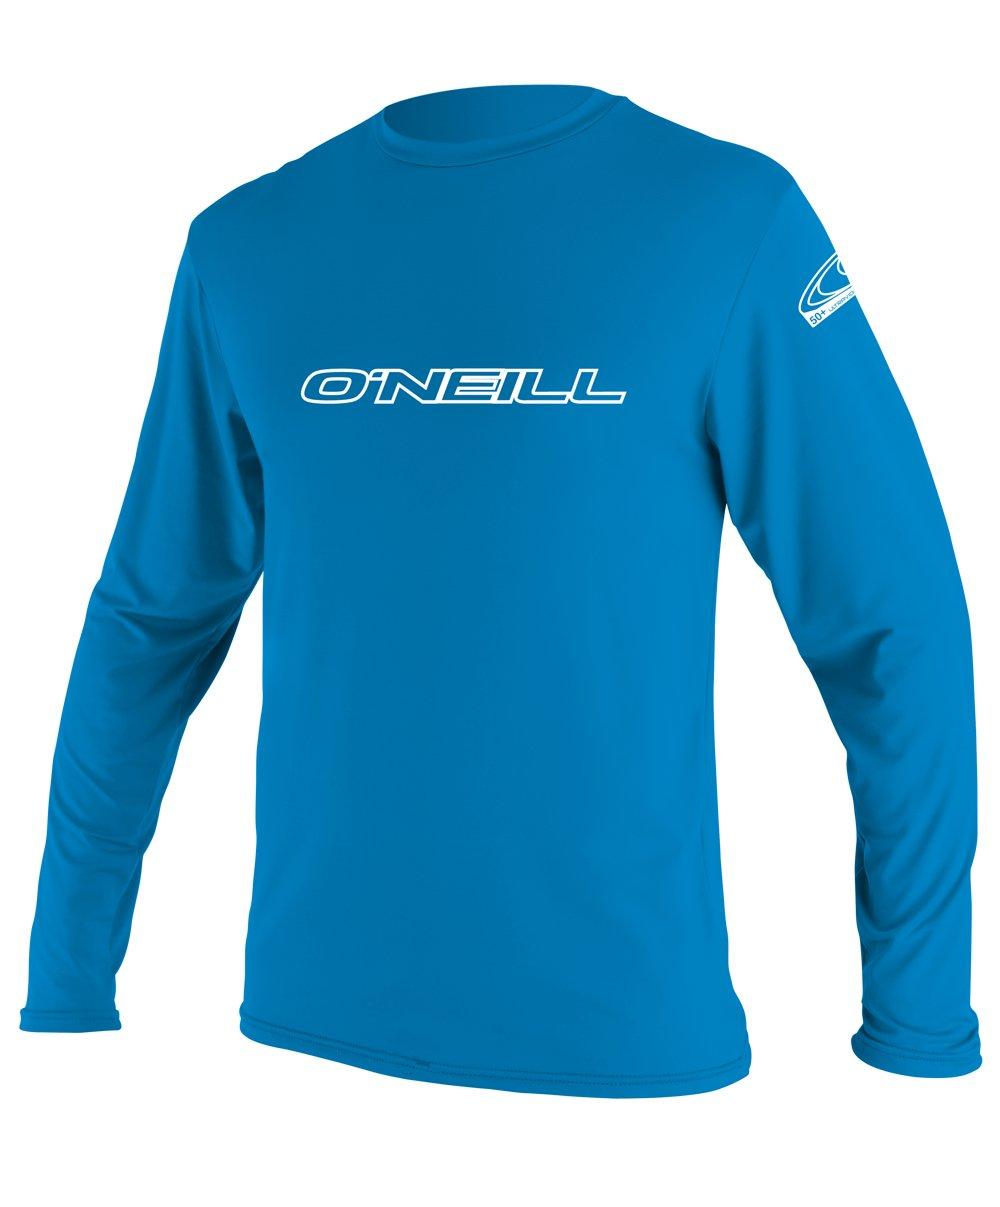 O'Neill Youth Basic Skins UPF 50+ Long Sleeve Sun Shirt, Bright Blue, 10